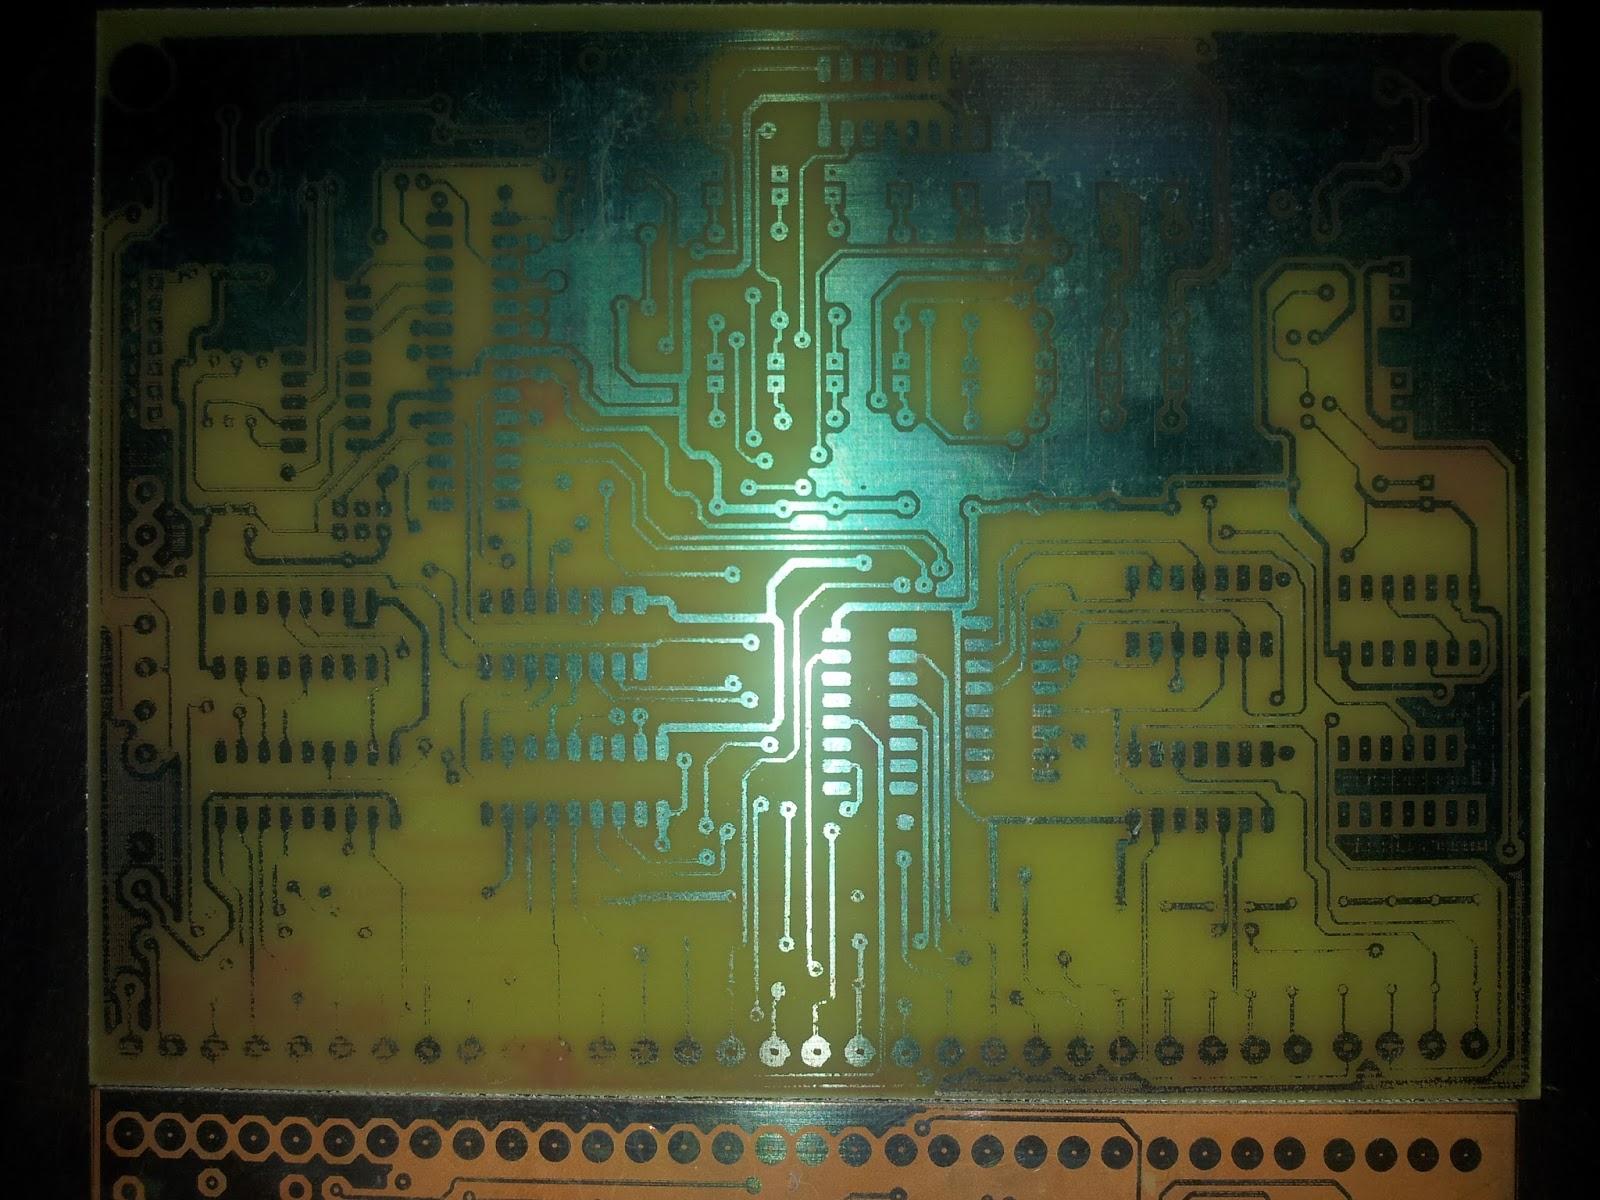 In Between Making Good Printed Circuit Boards Using Toner Transfer